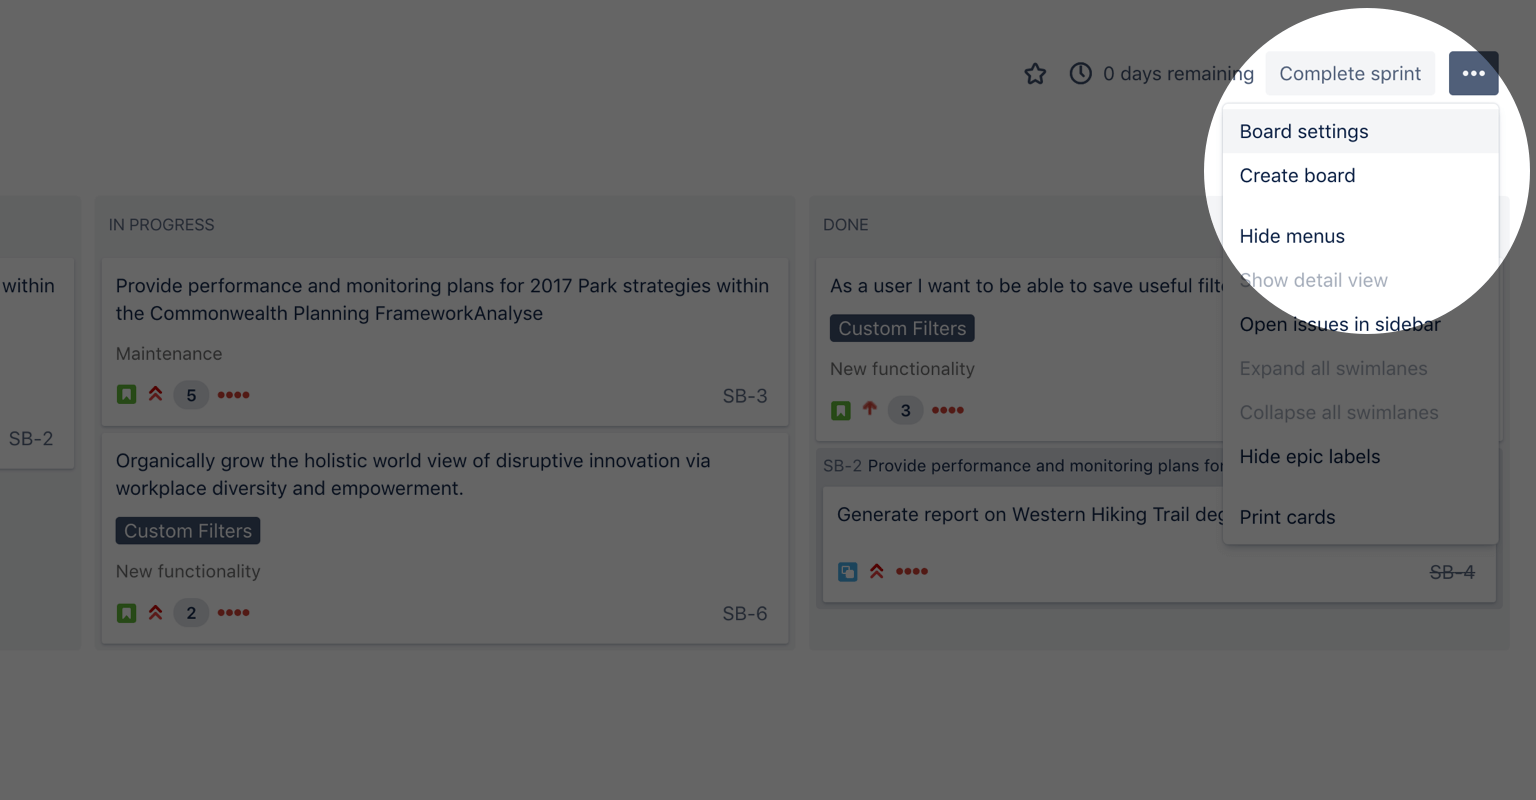 Снимок экрана, на котором подсвечена кнопка настроек